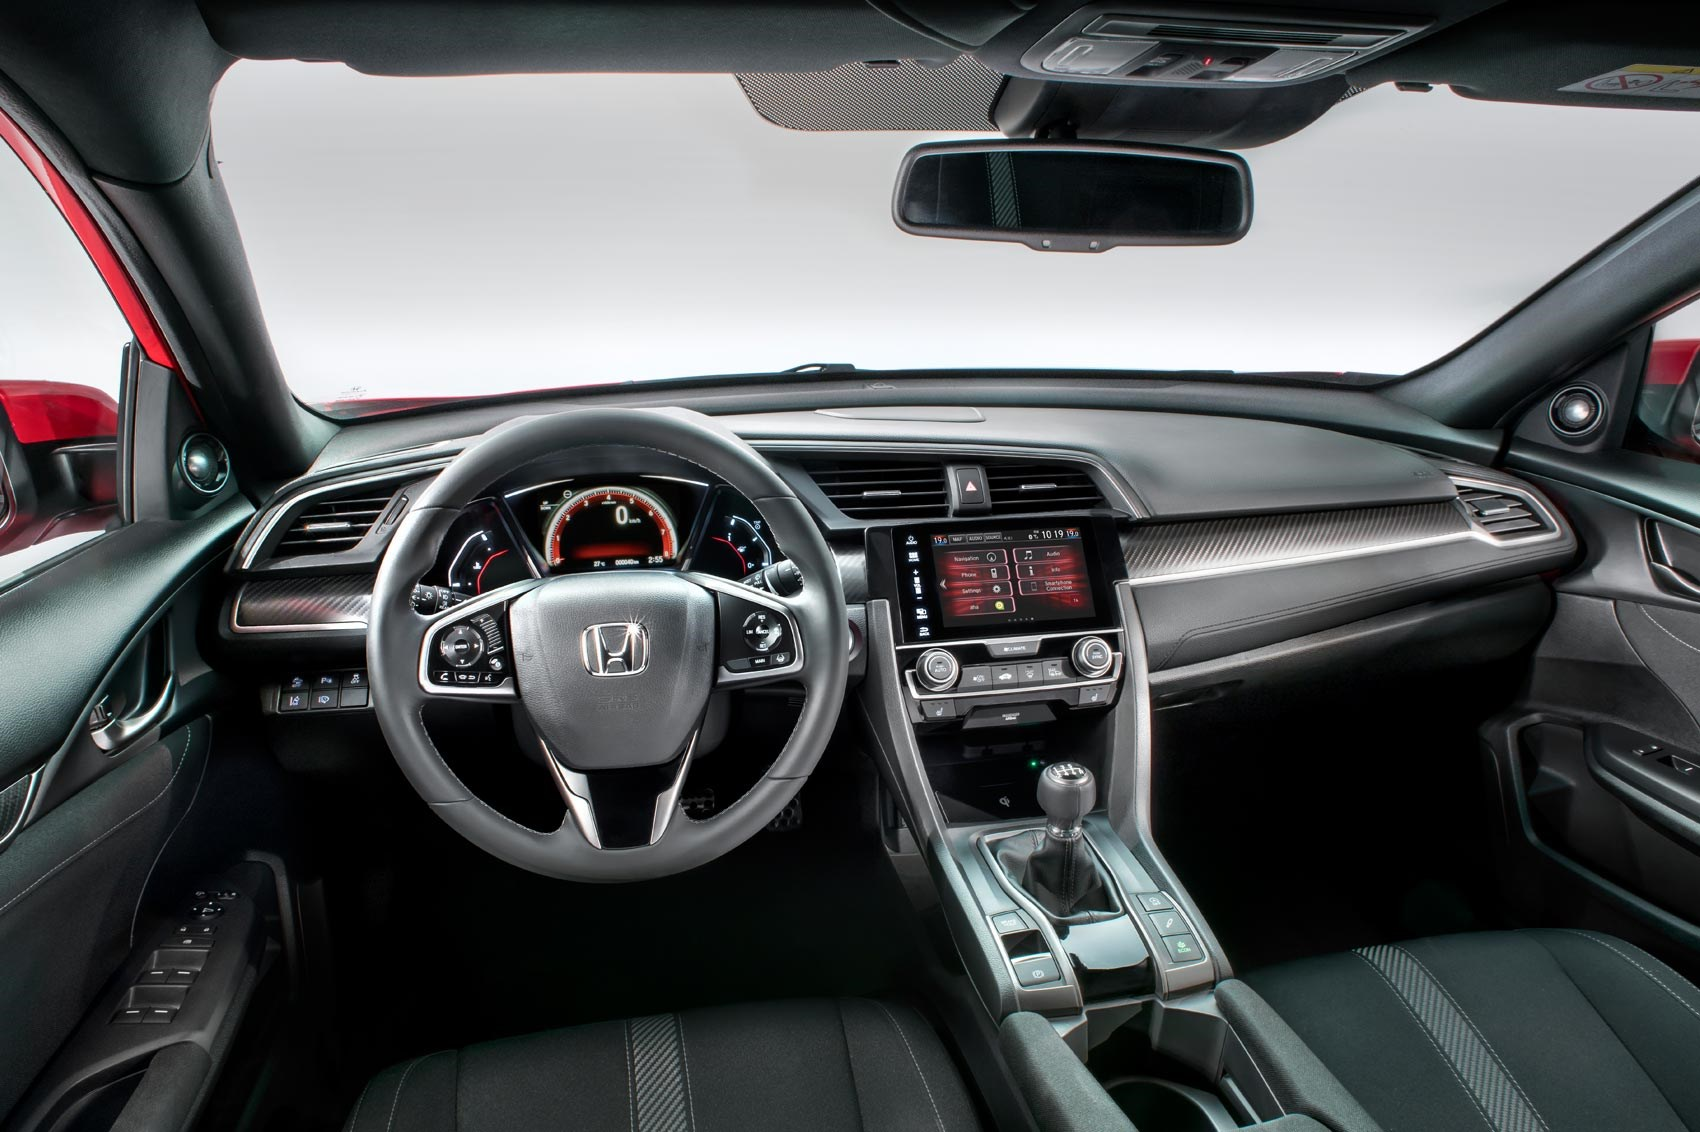 The New 2017 Honda Civic